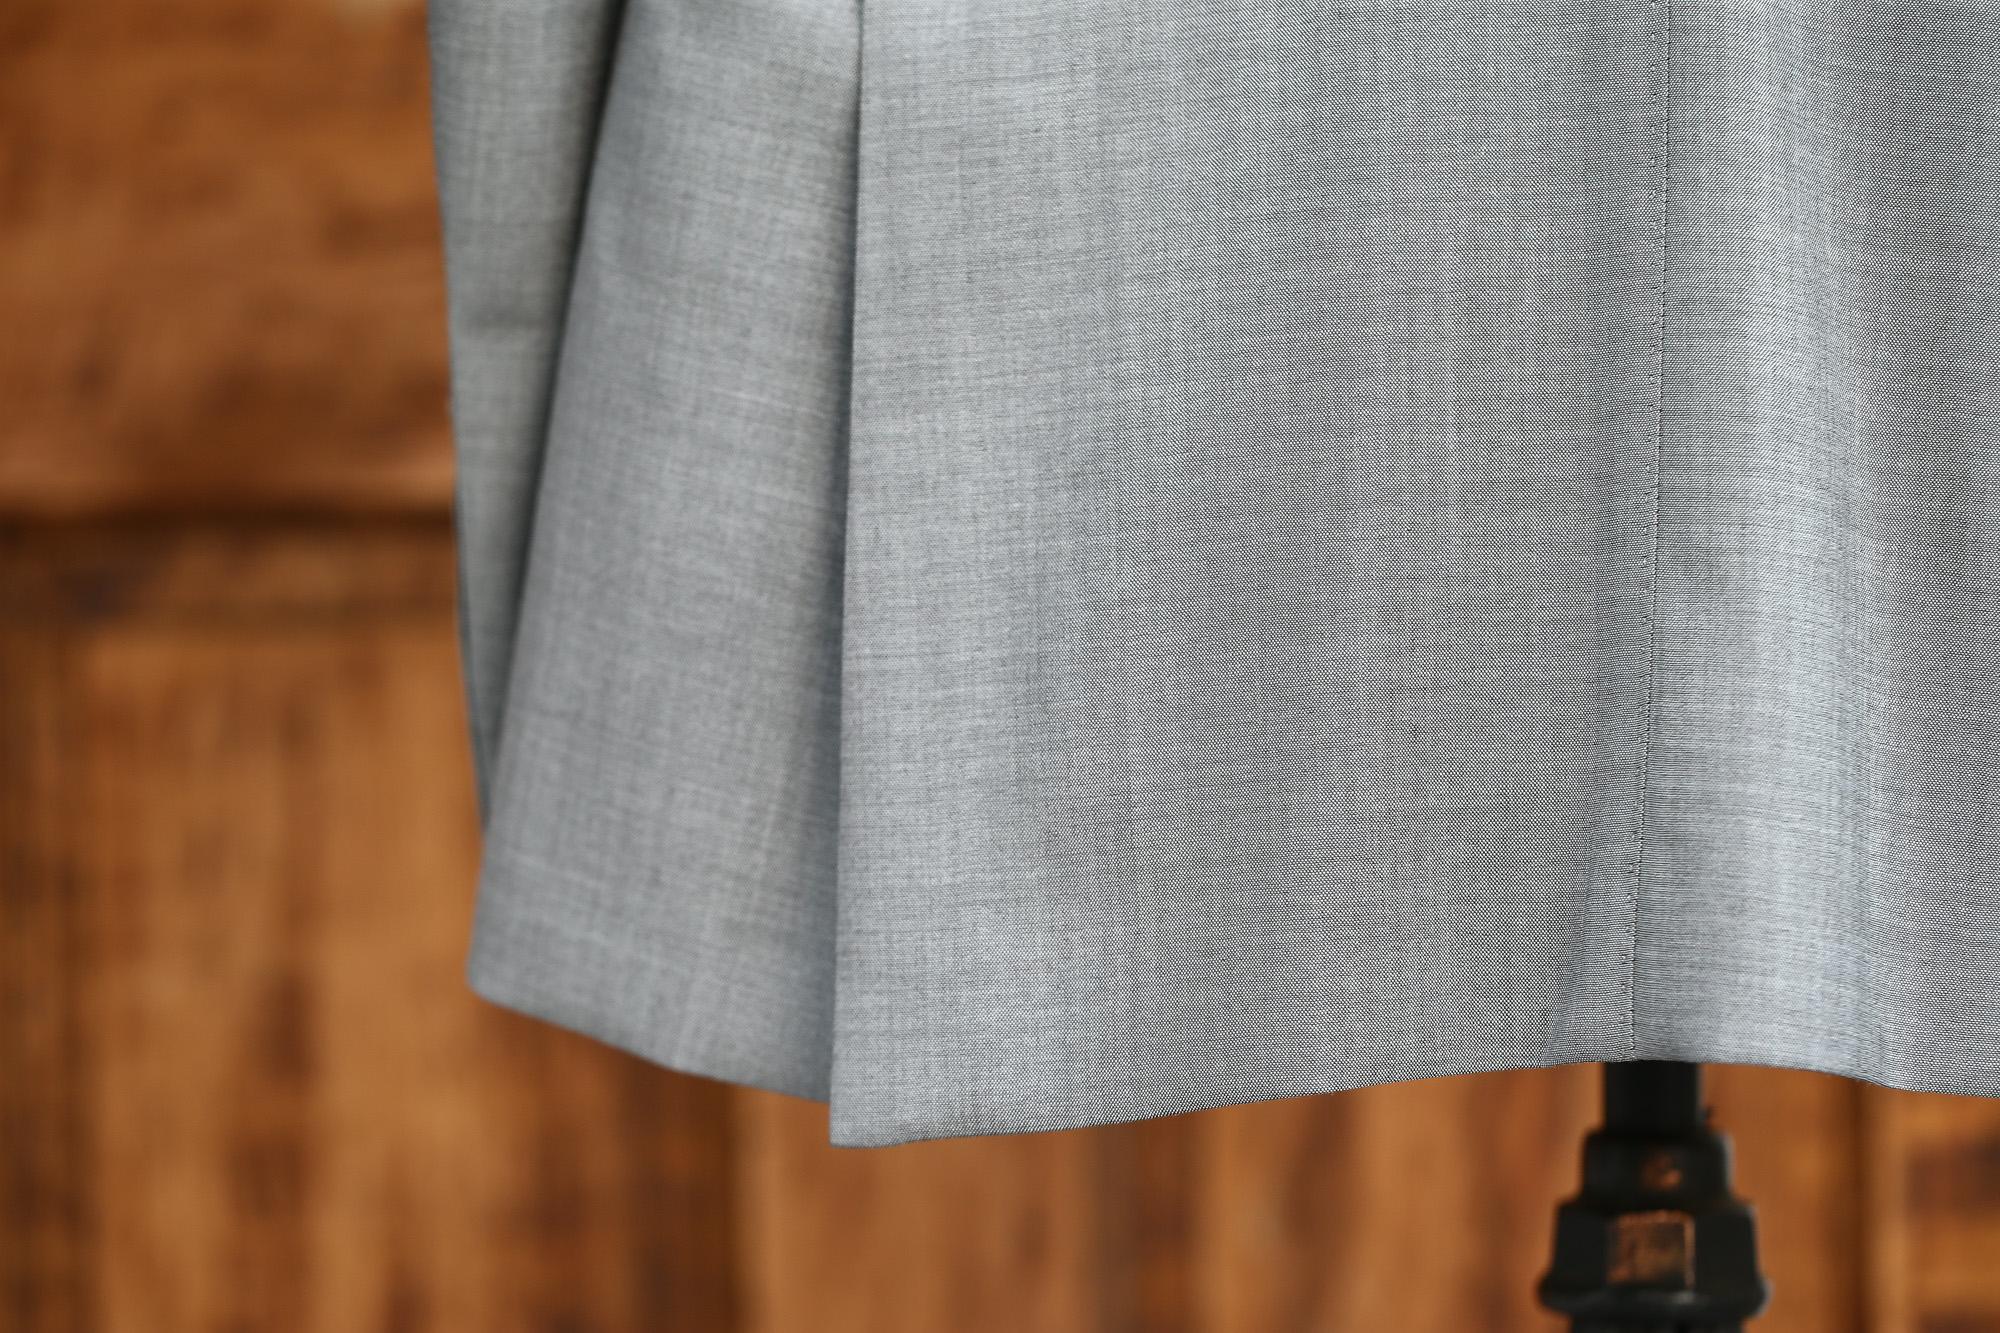 BOGLIOLI MILANO (ボリオリ ミラノ) K.JACKET (Kジャケット) ストレッチ サマーウール 3B スーツ GRAY (グレー・33) Made in italy (イタリア製) 2018 春夏新作 boglioli ボリオリ 愛知 名古屋 Alto e Diritto アルト エ デリット